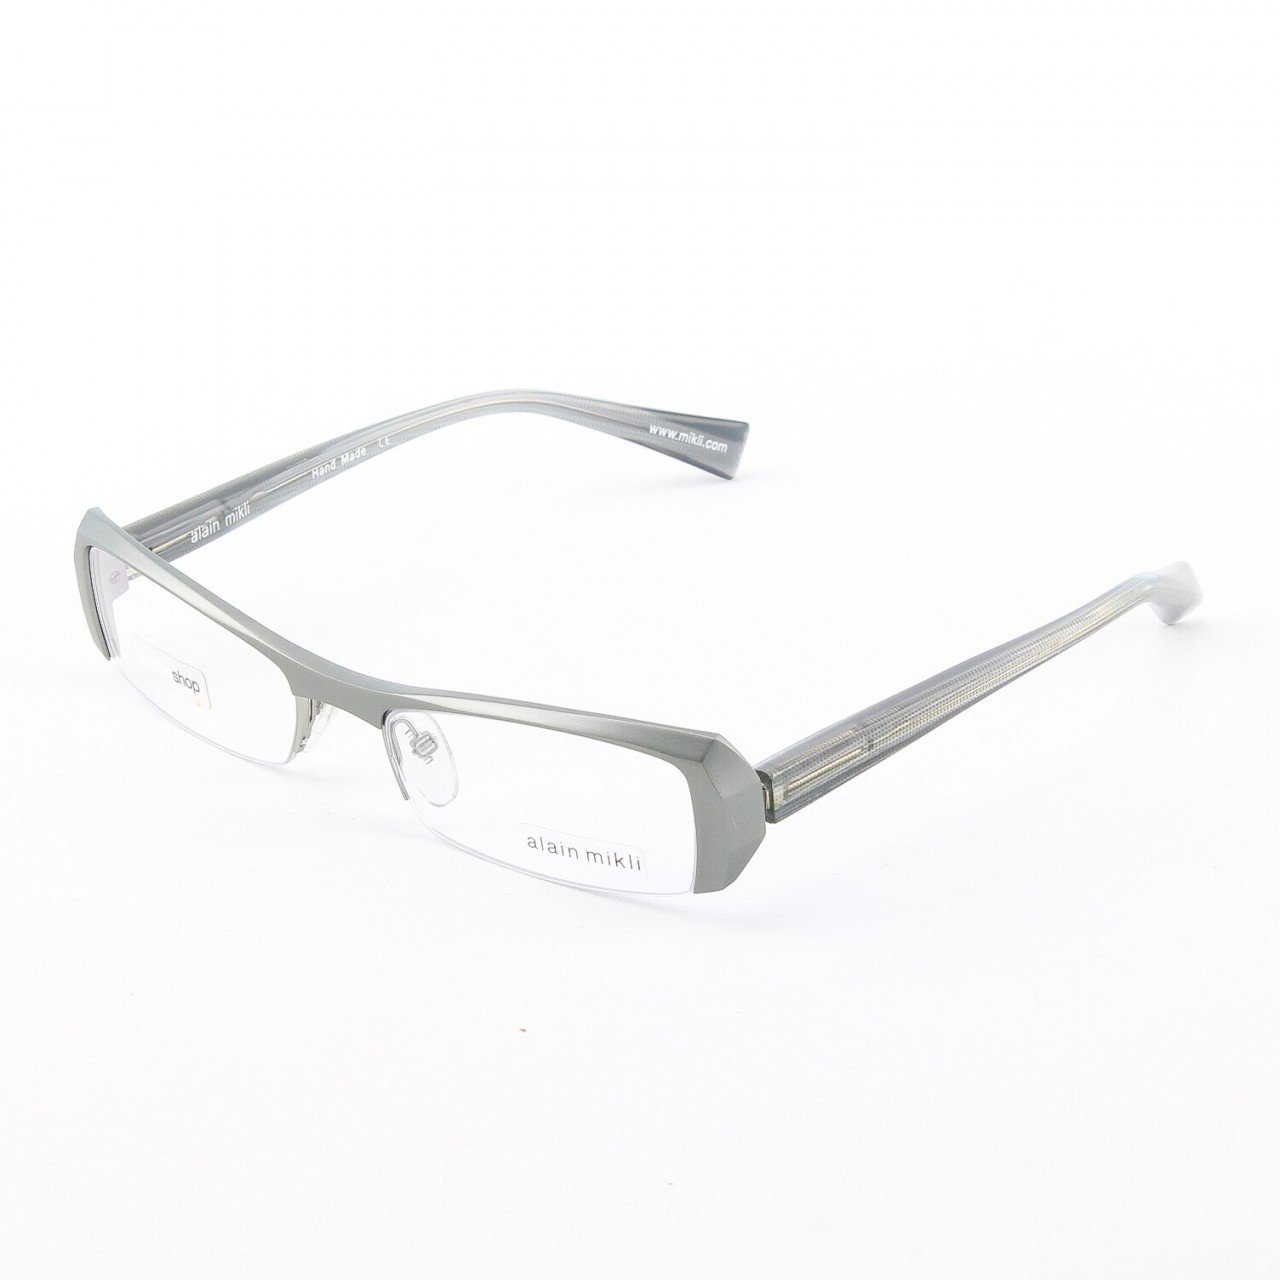 Alain Mikli Eyeglasses AL0613 Col. 18 Matte Silver Frame with Translucent Silver Temples